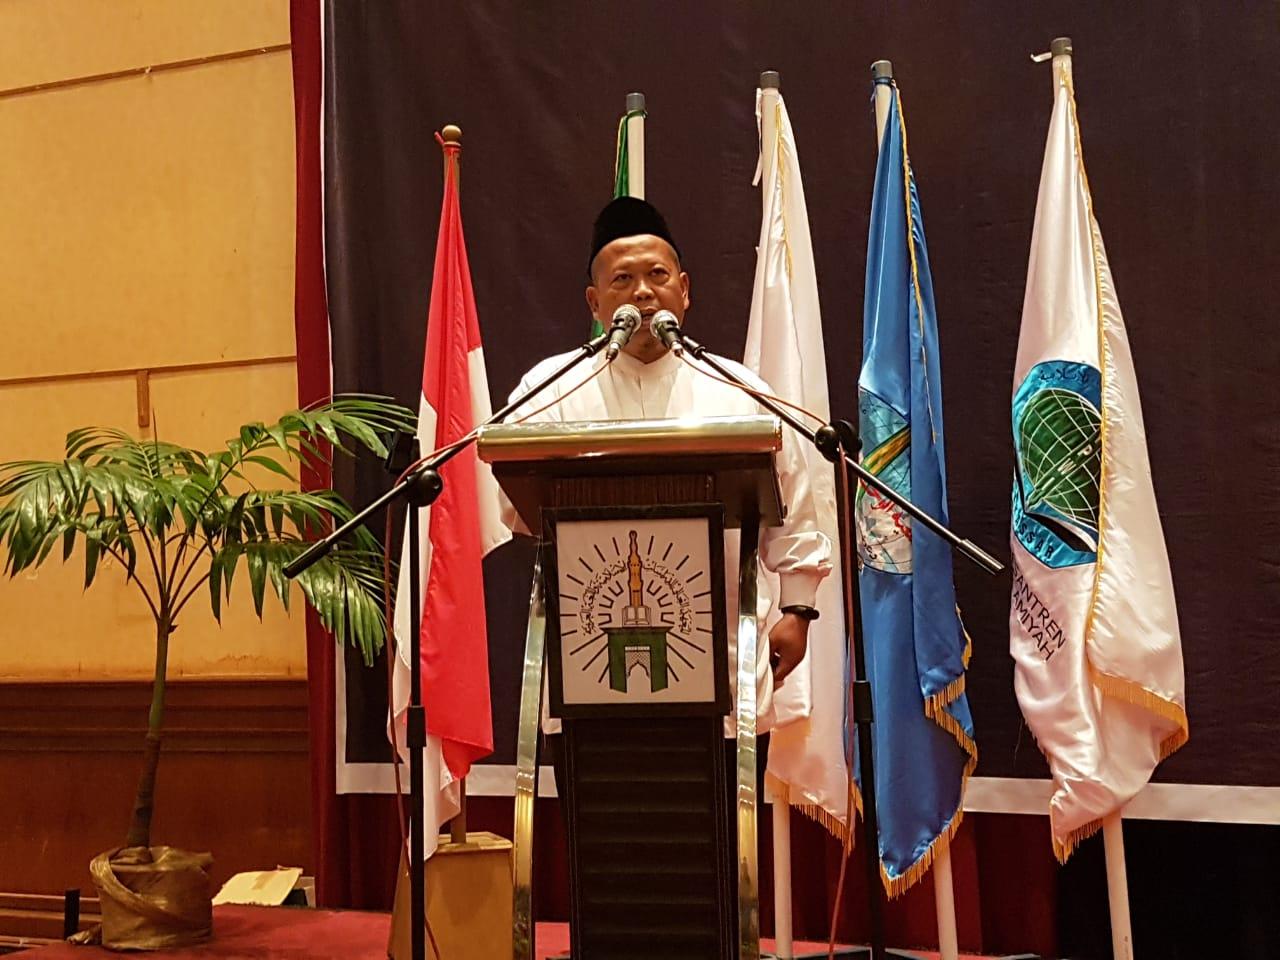 Wisuda STIBA Makassar, Adian Husaini Jelaskan Spirit Pendidikan Terbaik Sesuai UUD